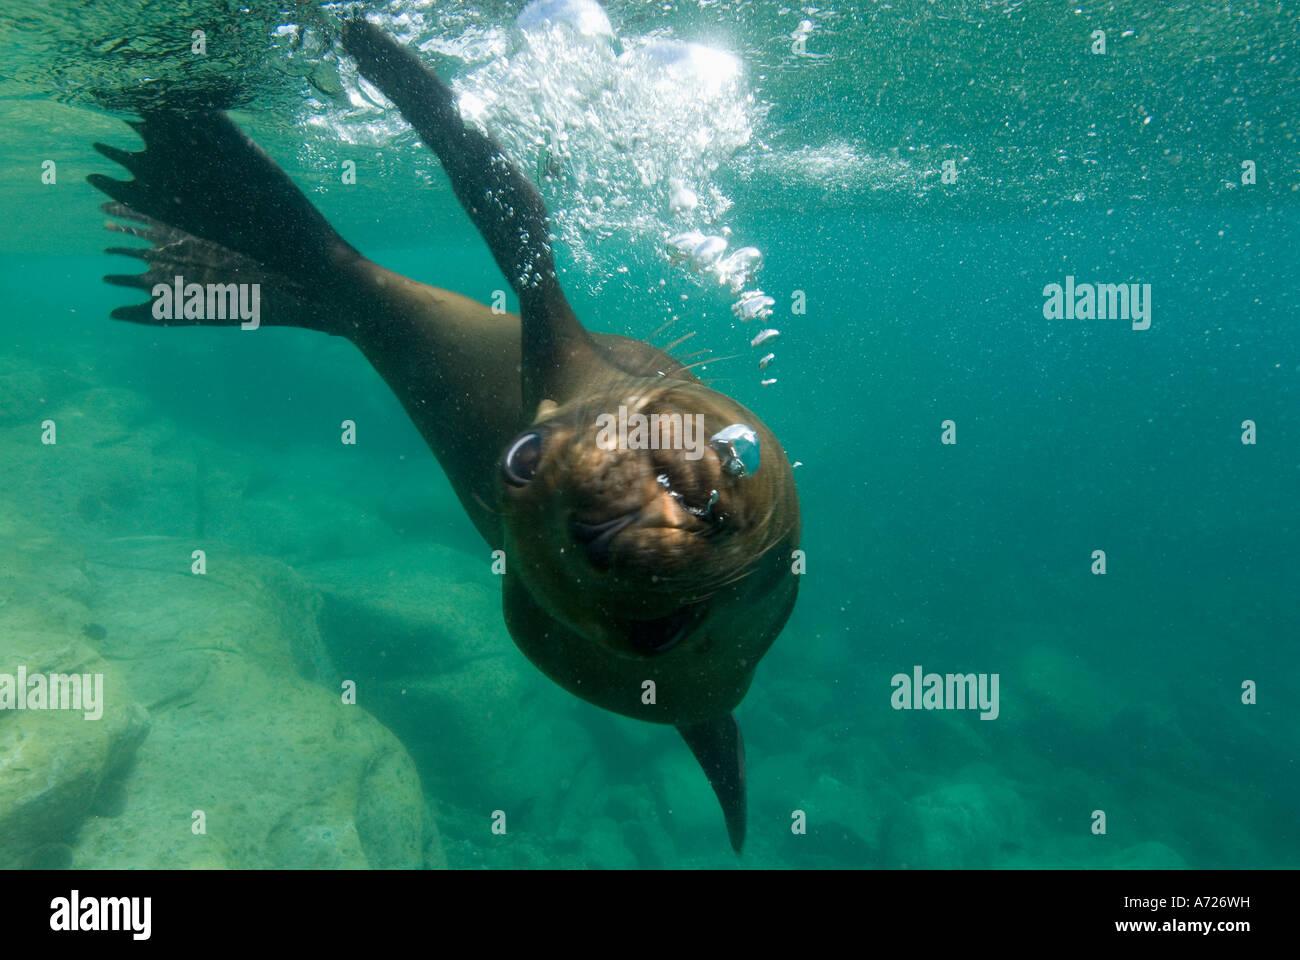 León marino de California (Zalophus californianus) debajo del agua del mar de Cortés, los islotes, Baja Imagen De Stock